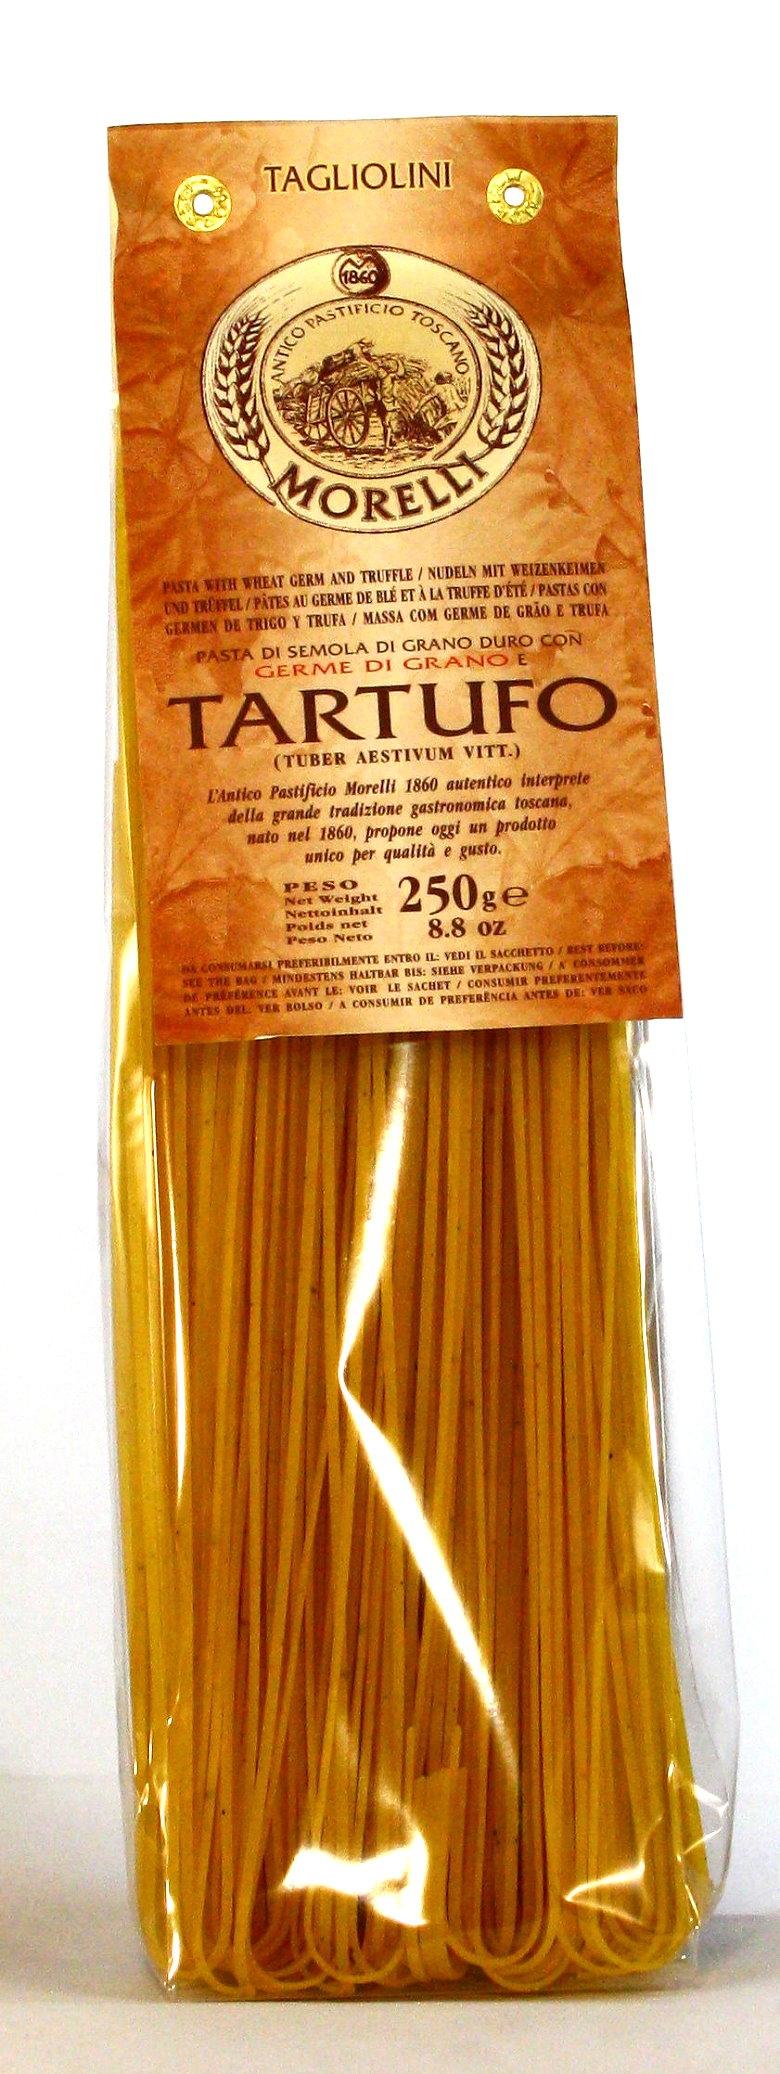 Linguine al Tartufo - Trüffelnudeln, Morelli